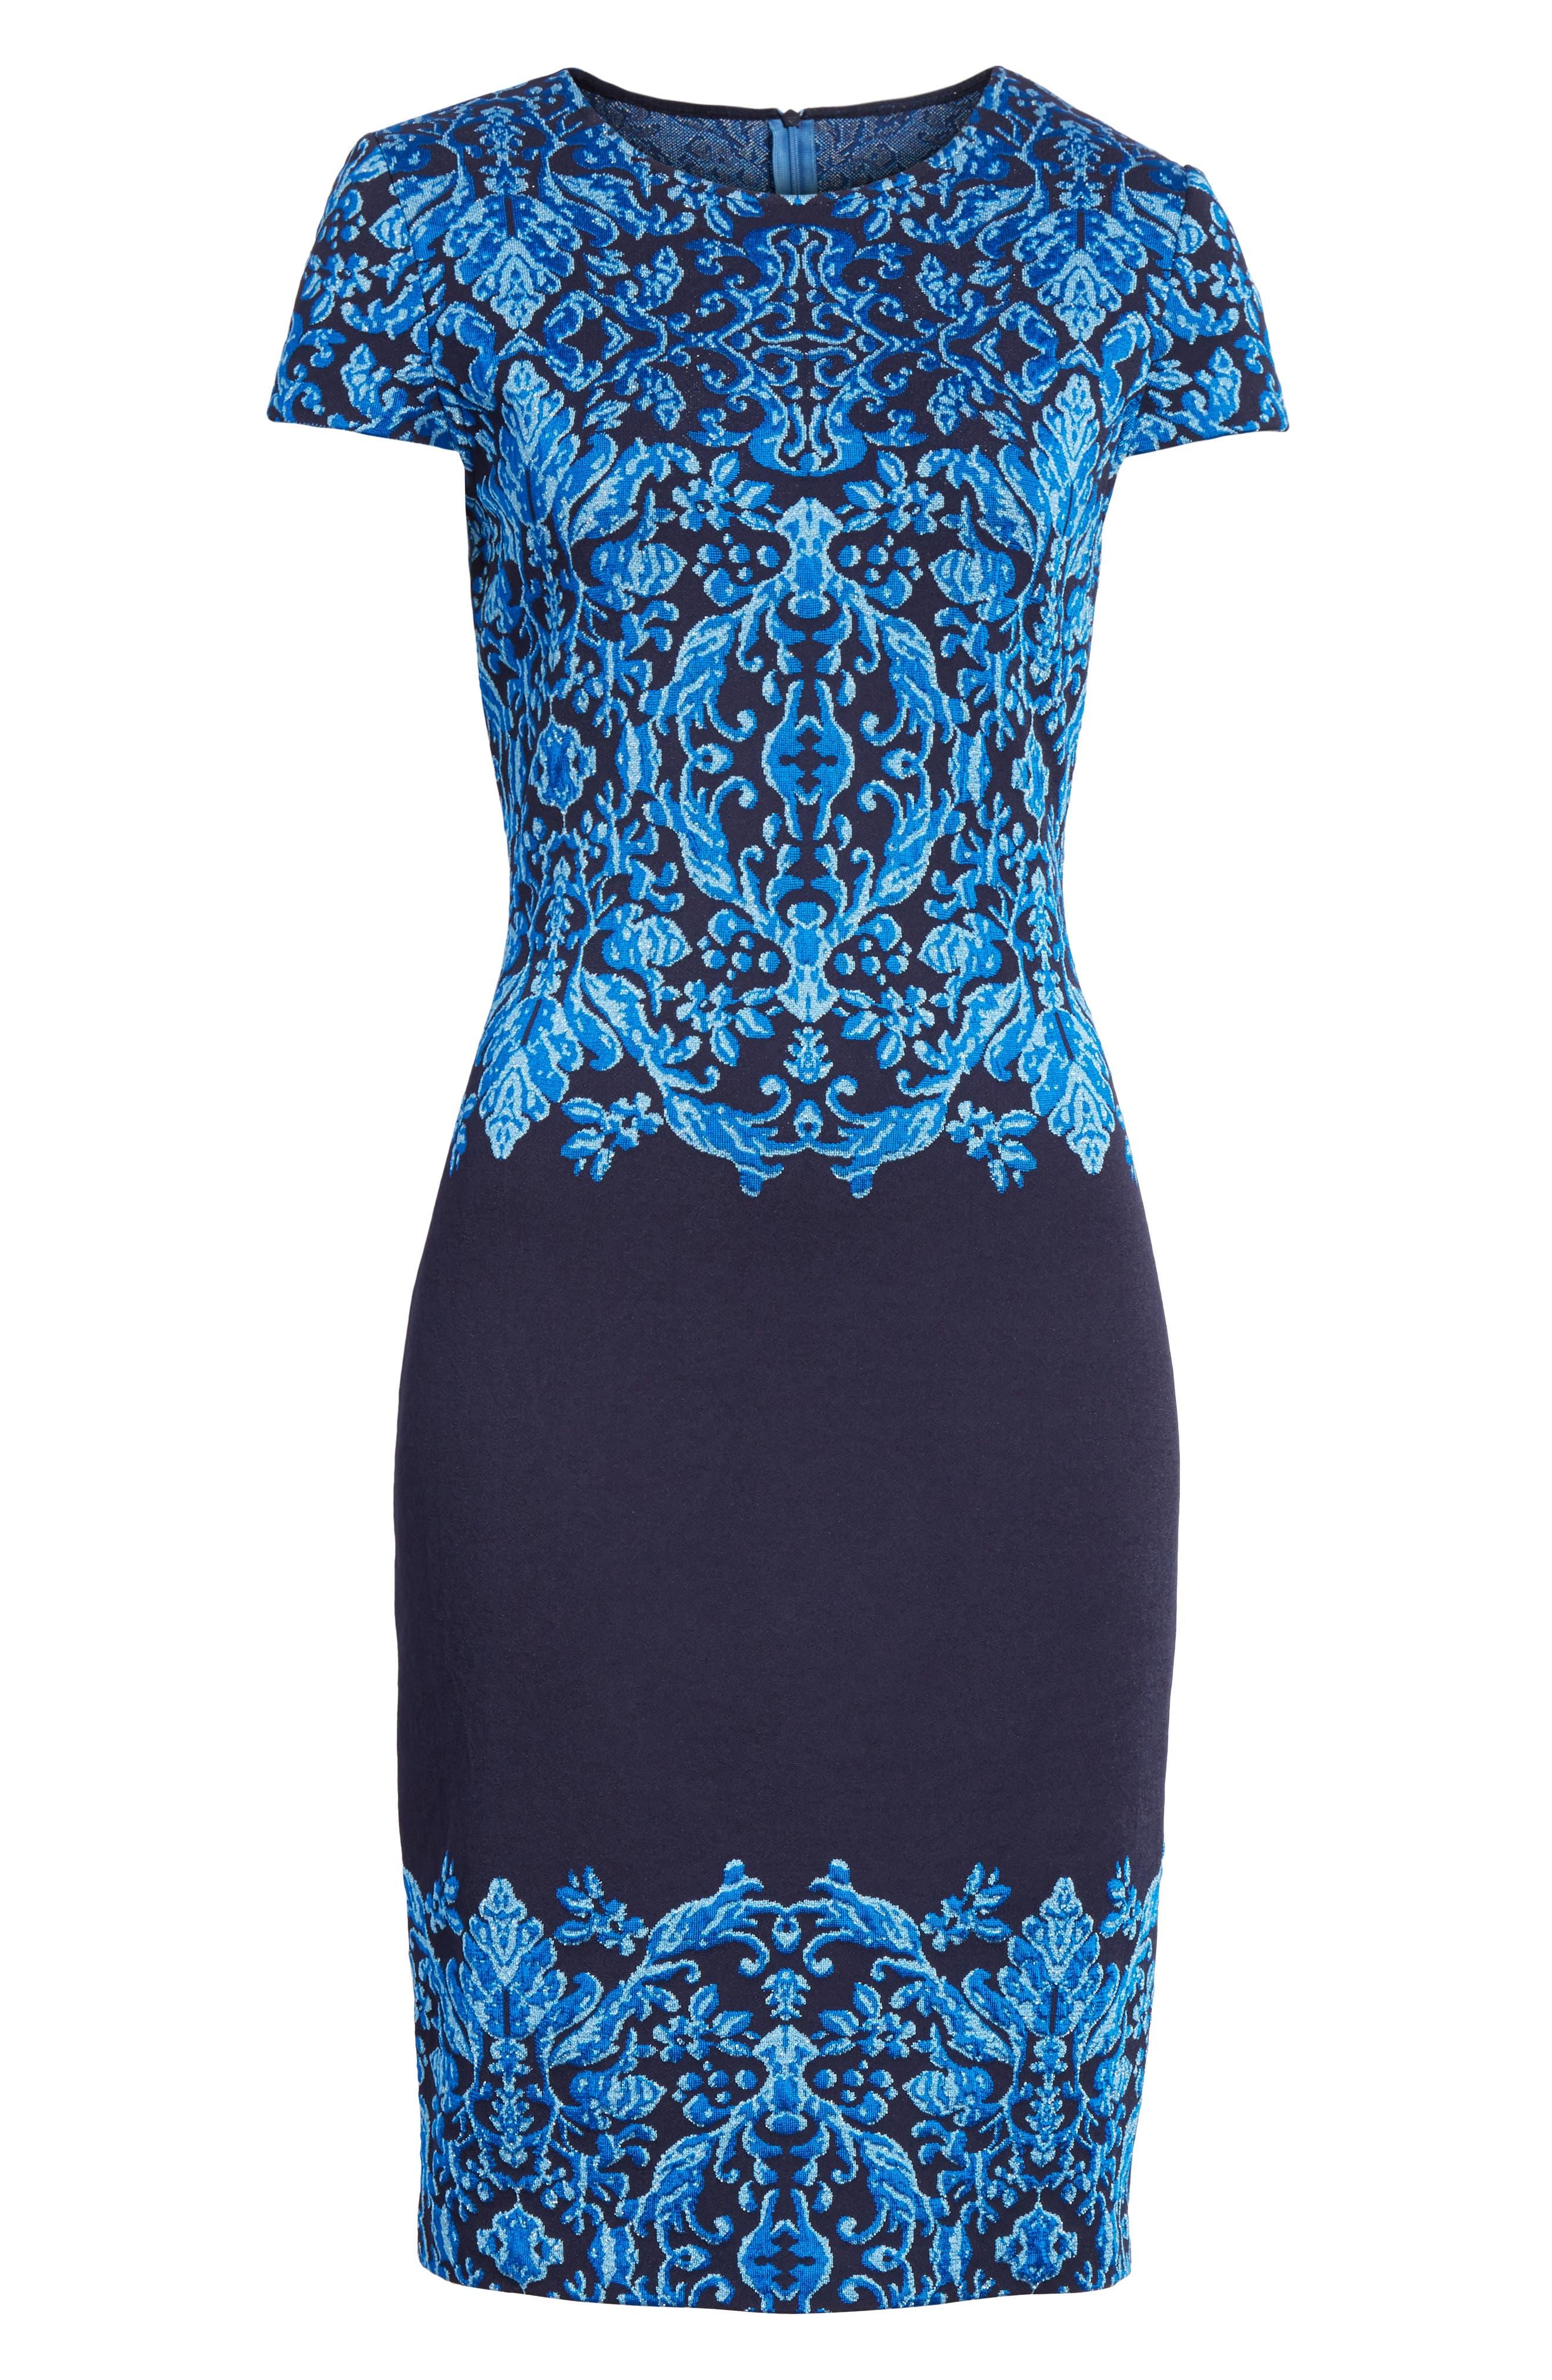 Cool Tones Brocade Knit Dress,                             Alternate thumbnail 7, color,                             COBALT MULTI